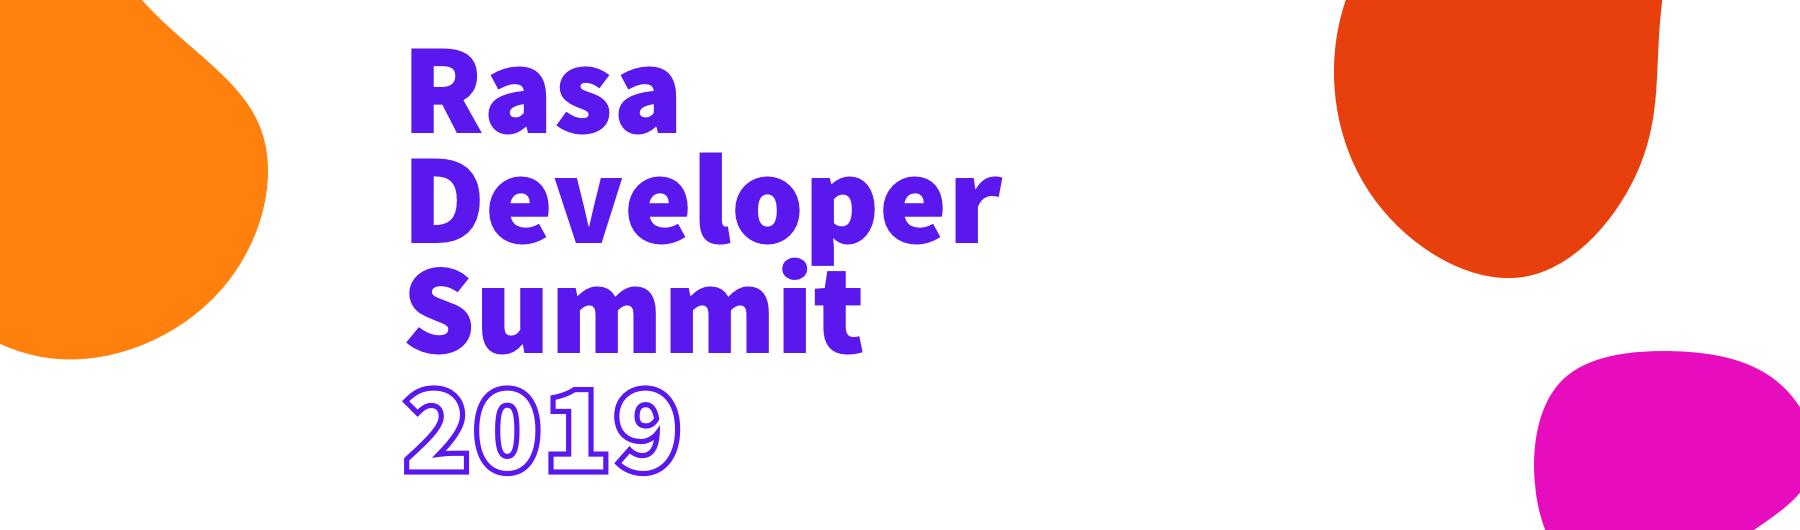 Rasa Developer Summit 2019